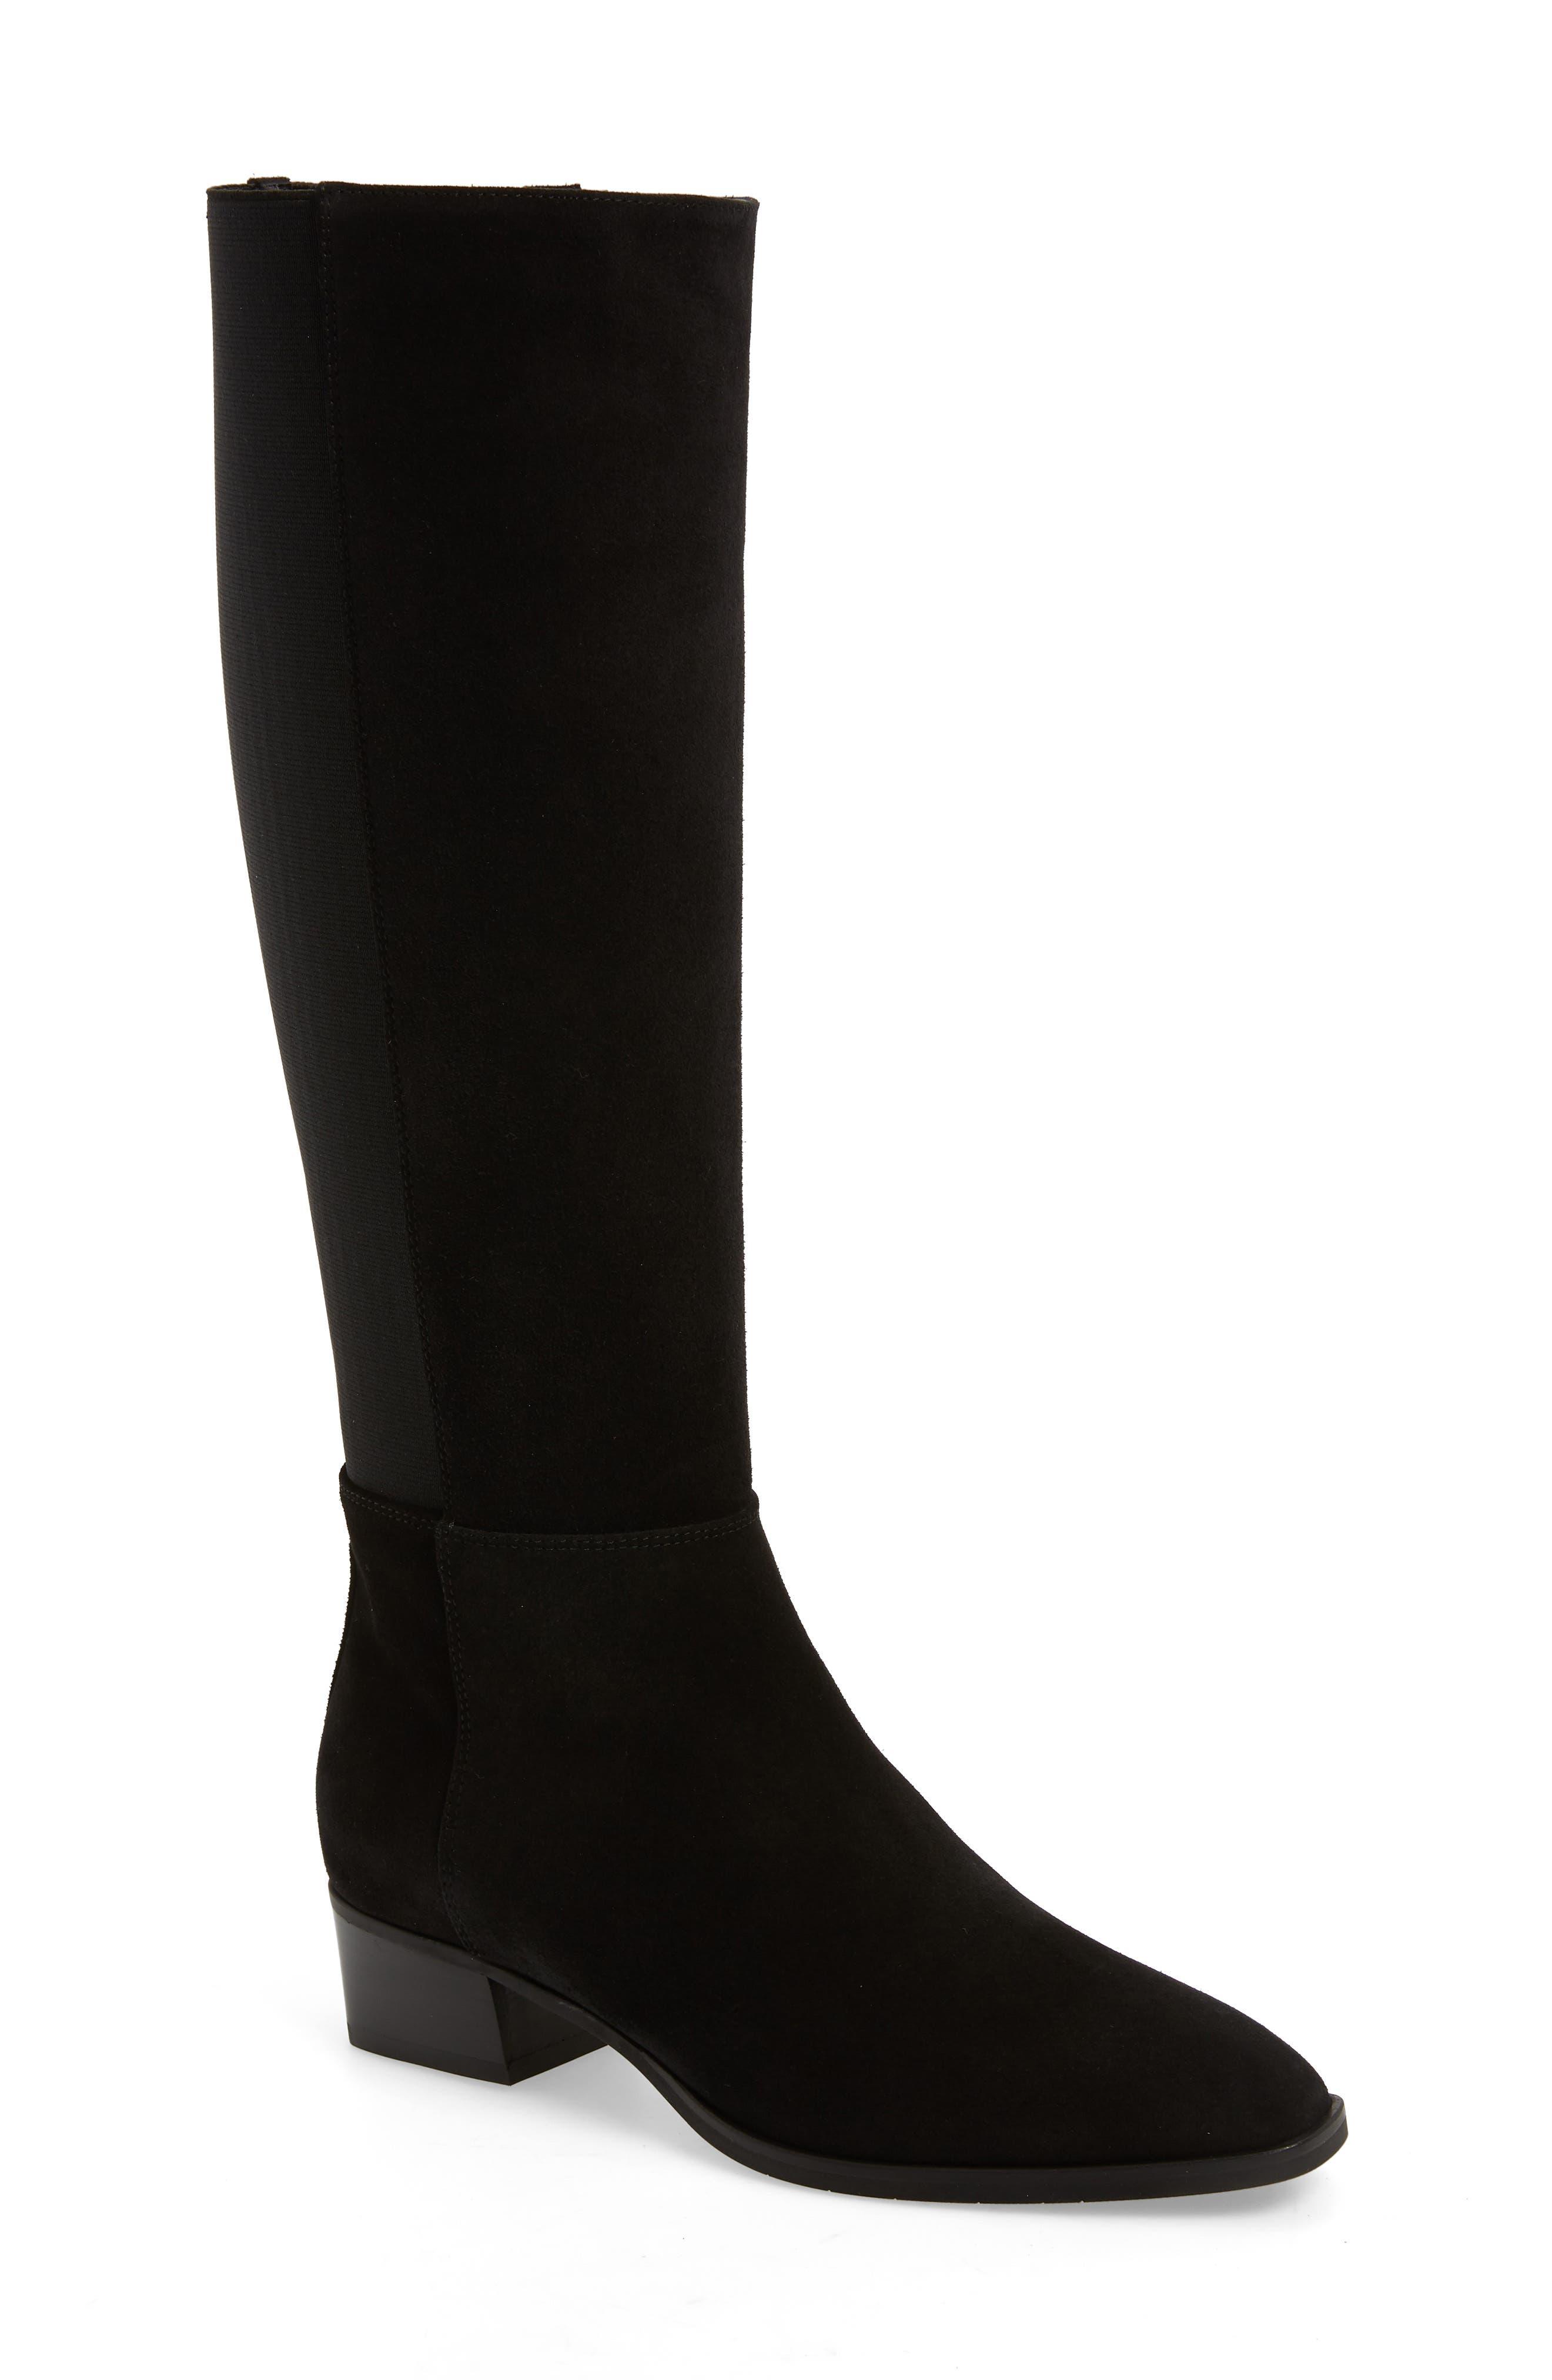 Sale alerts for  Finola Weatherproof Stretch Back Boot - Covvet